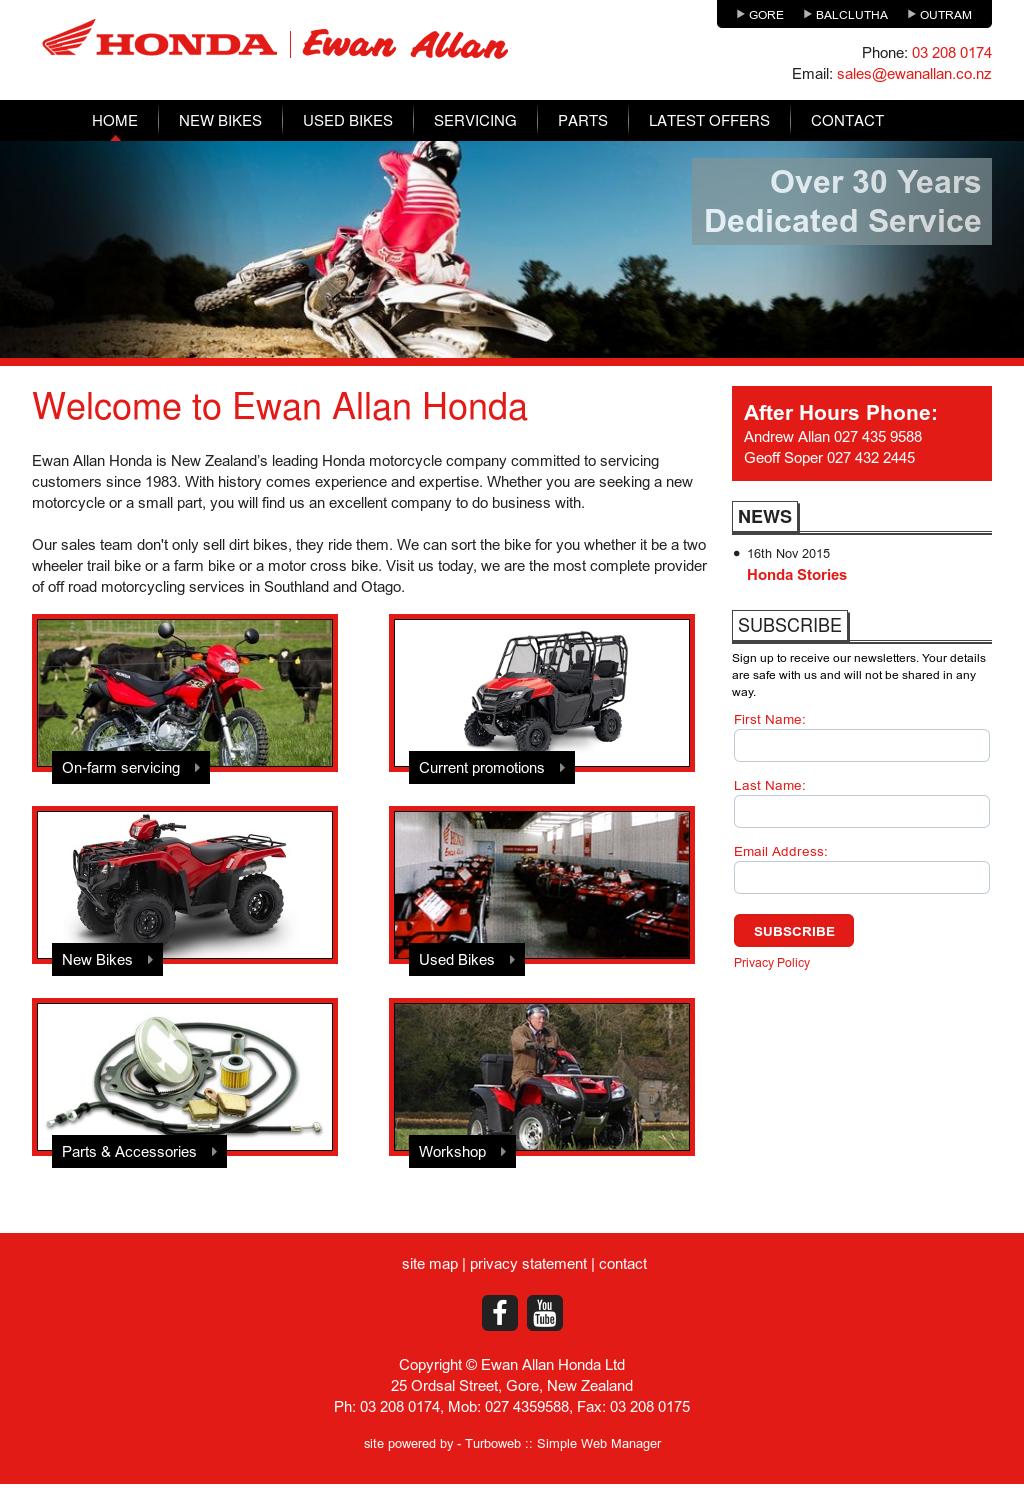 Ewan Allan Honda Website History